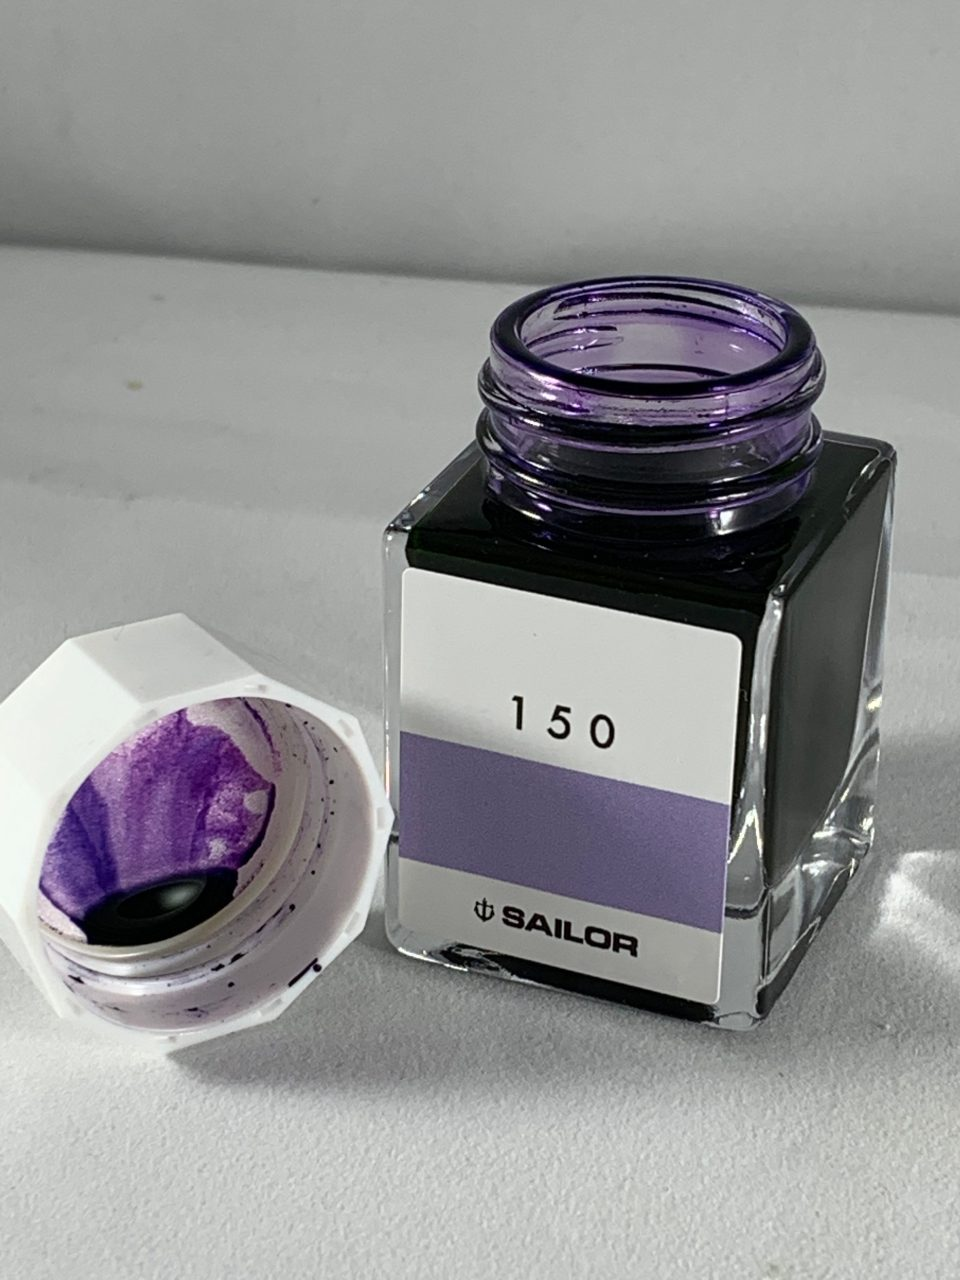 Ink Review: Sailor Studio 150